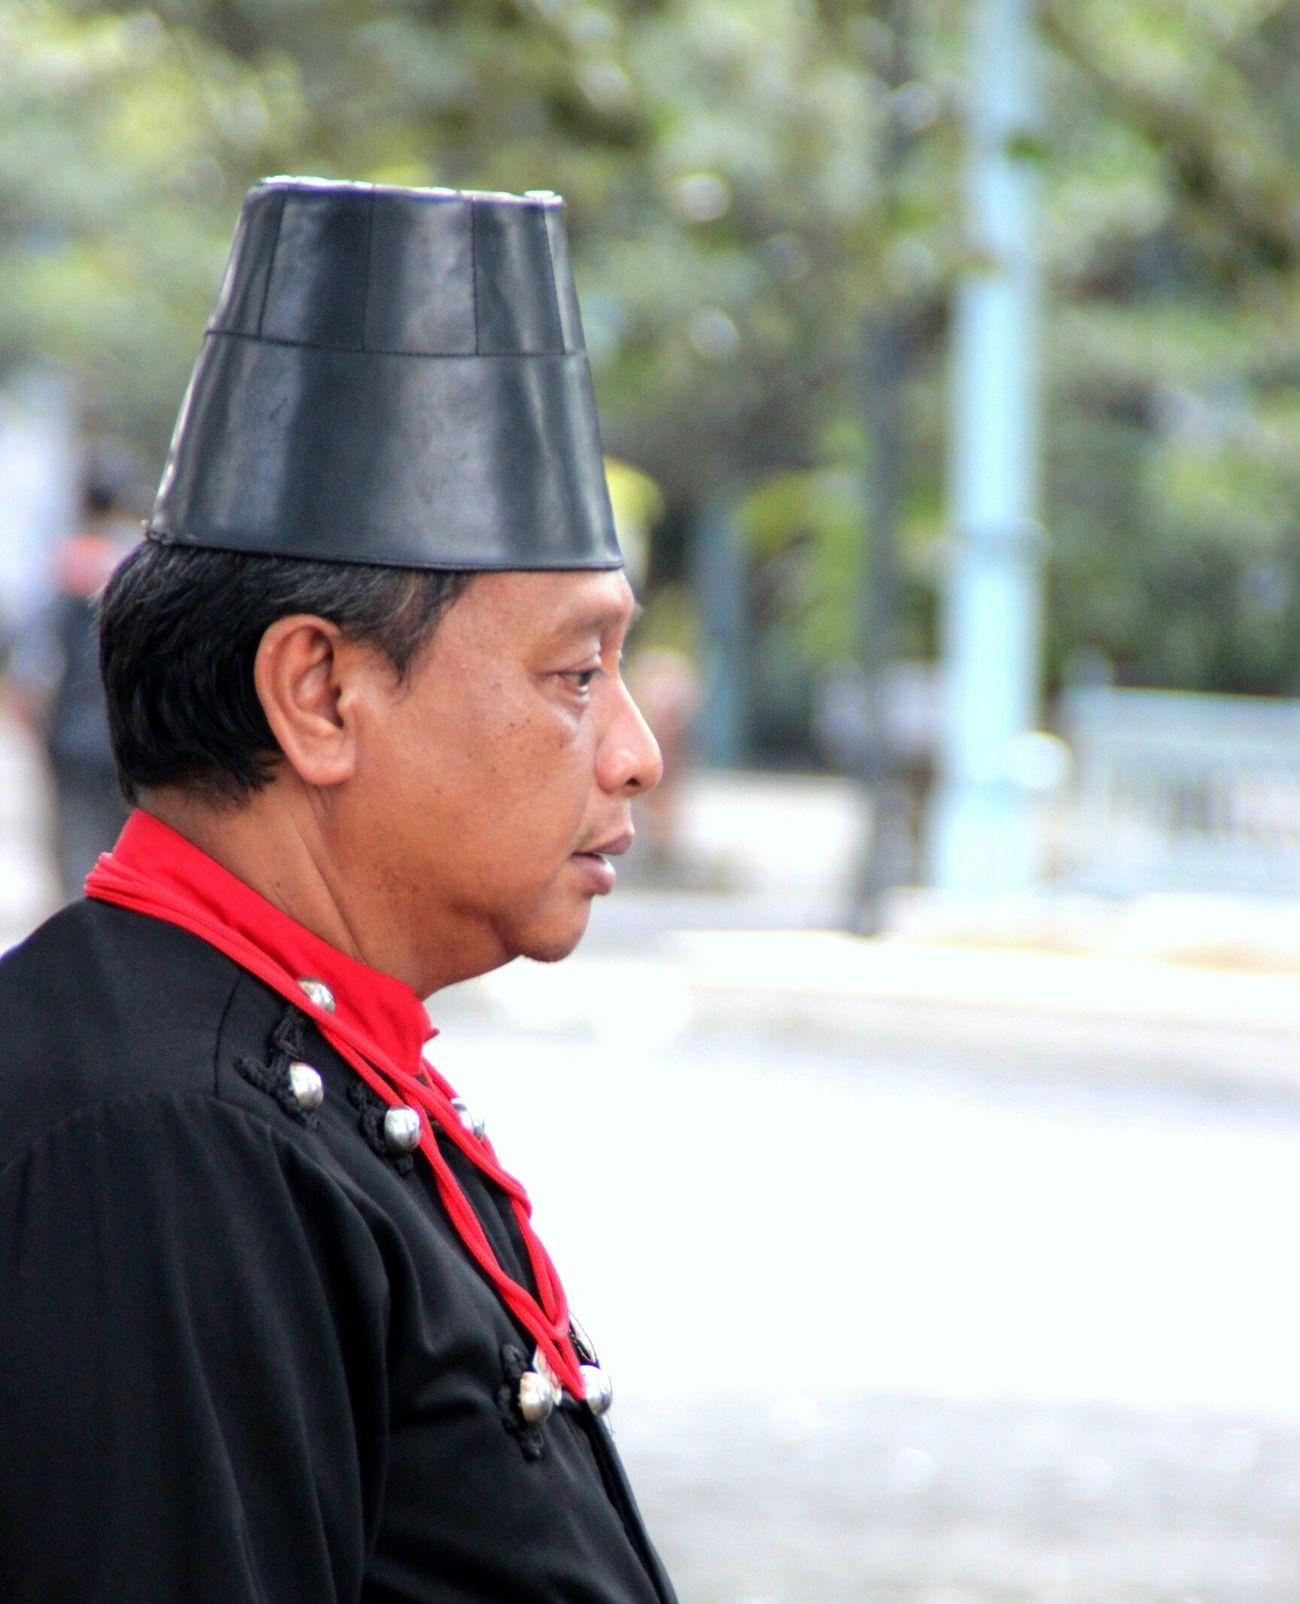 Abdi Dalem Javanese Culture Faces Of EyeEm Portrait Person Arts Culture And Entertainment Indonesia Culture EyeEmBestPics Showcase:December